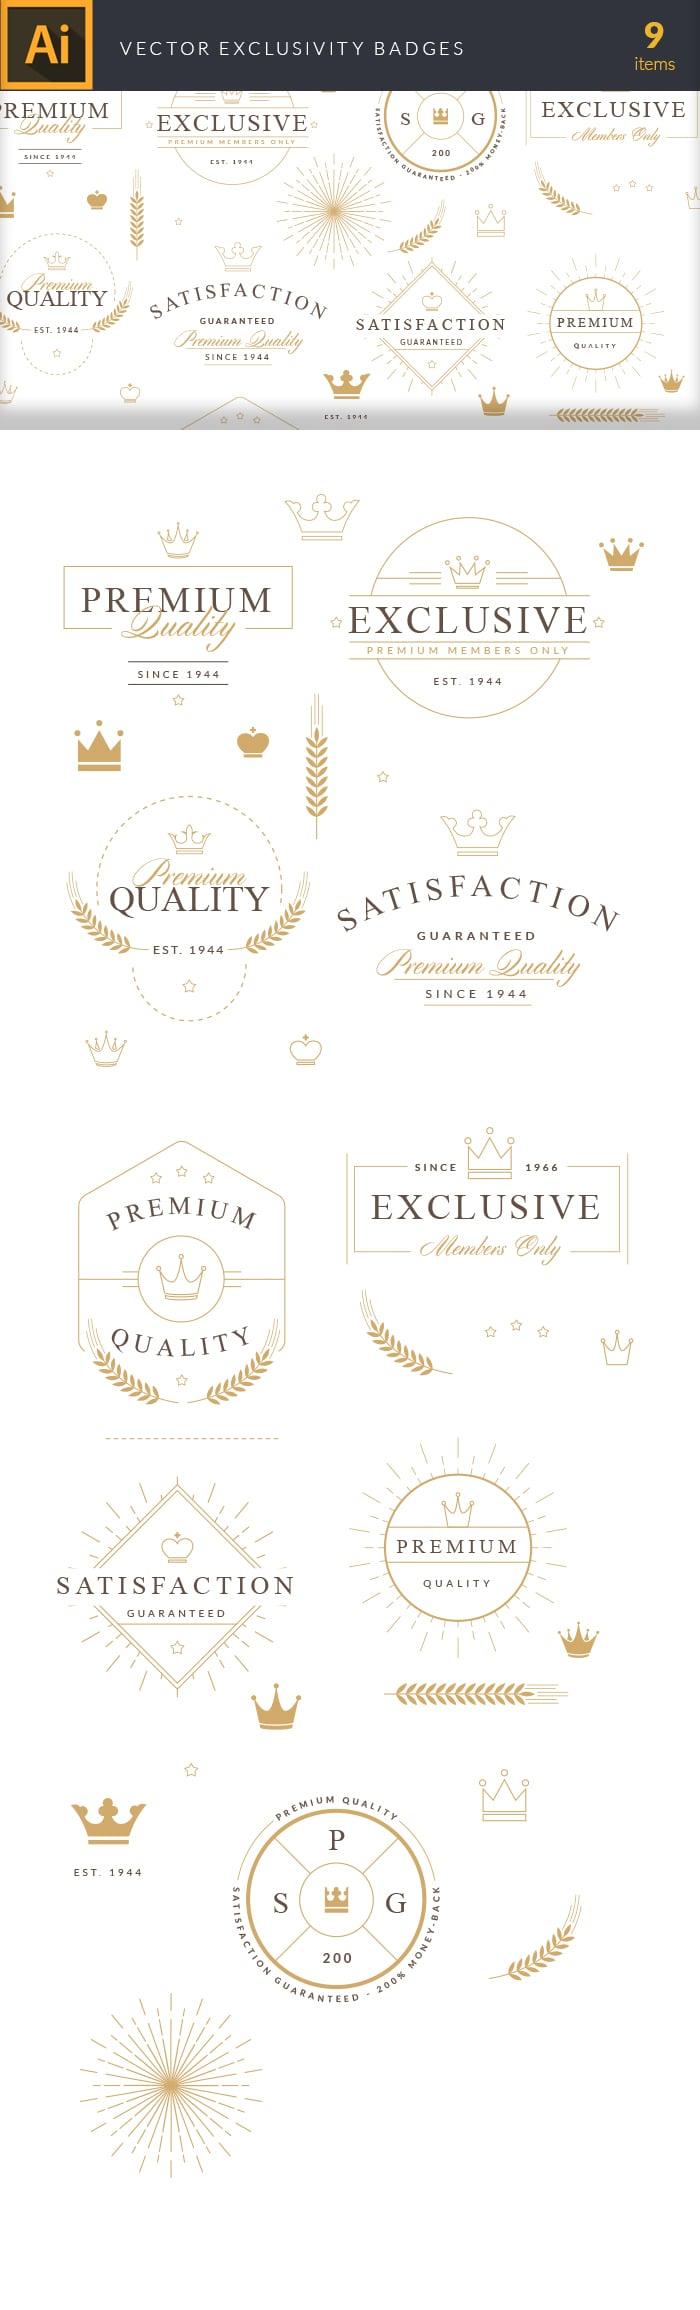 The Best Mega Graphics Bundle. 1000+ Premium Items for $49 - vector exclusivity badges large1